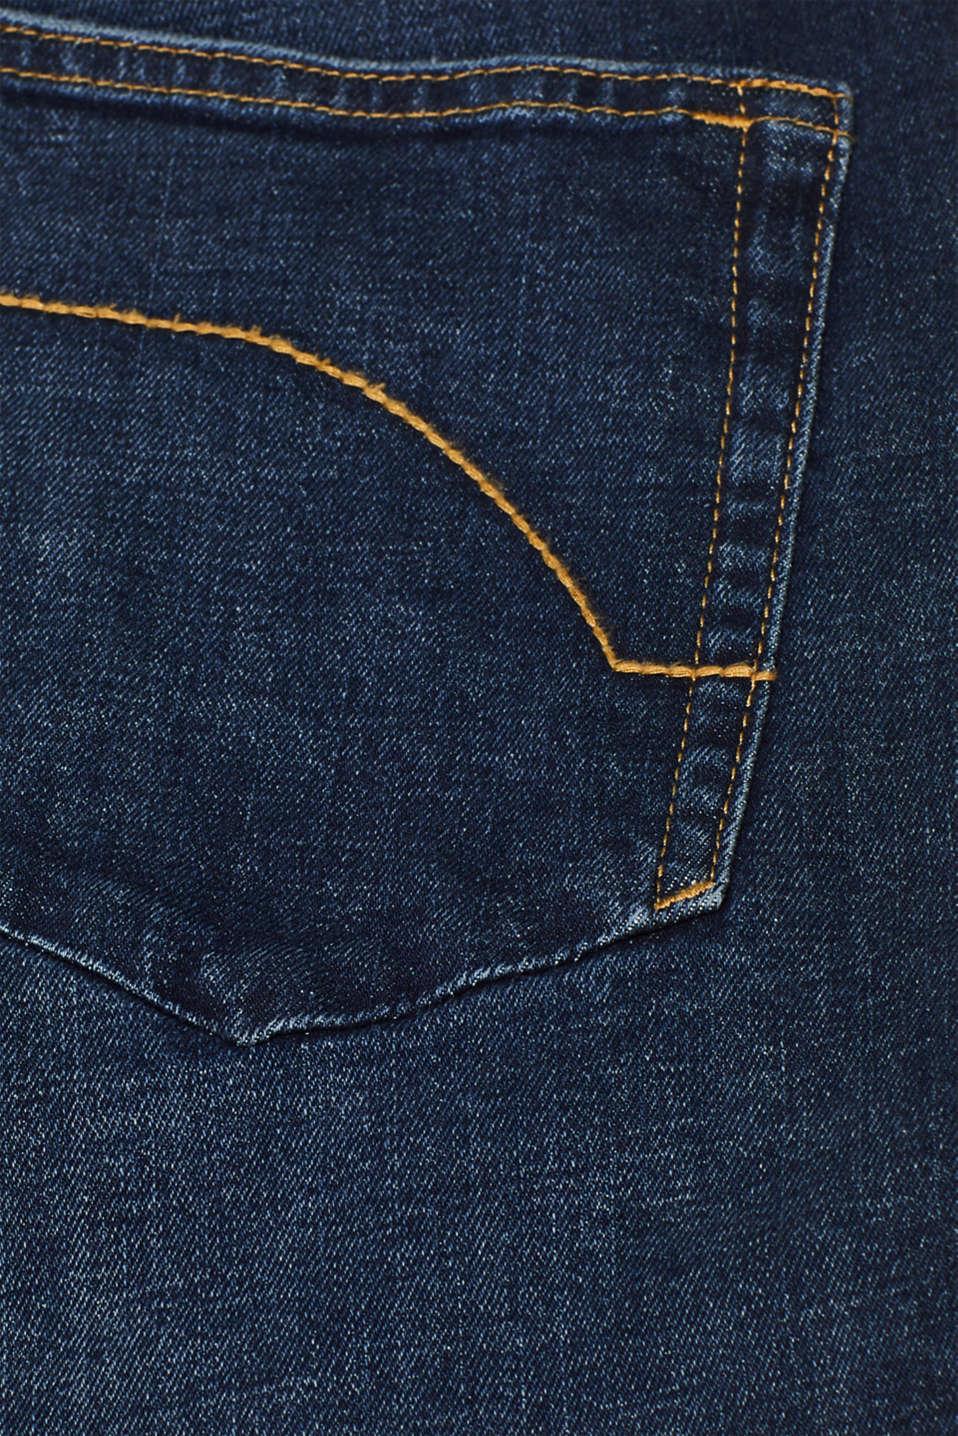 Pants denim Slim fit, BLUE DARK WASH, detail image number 4